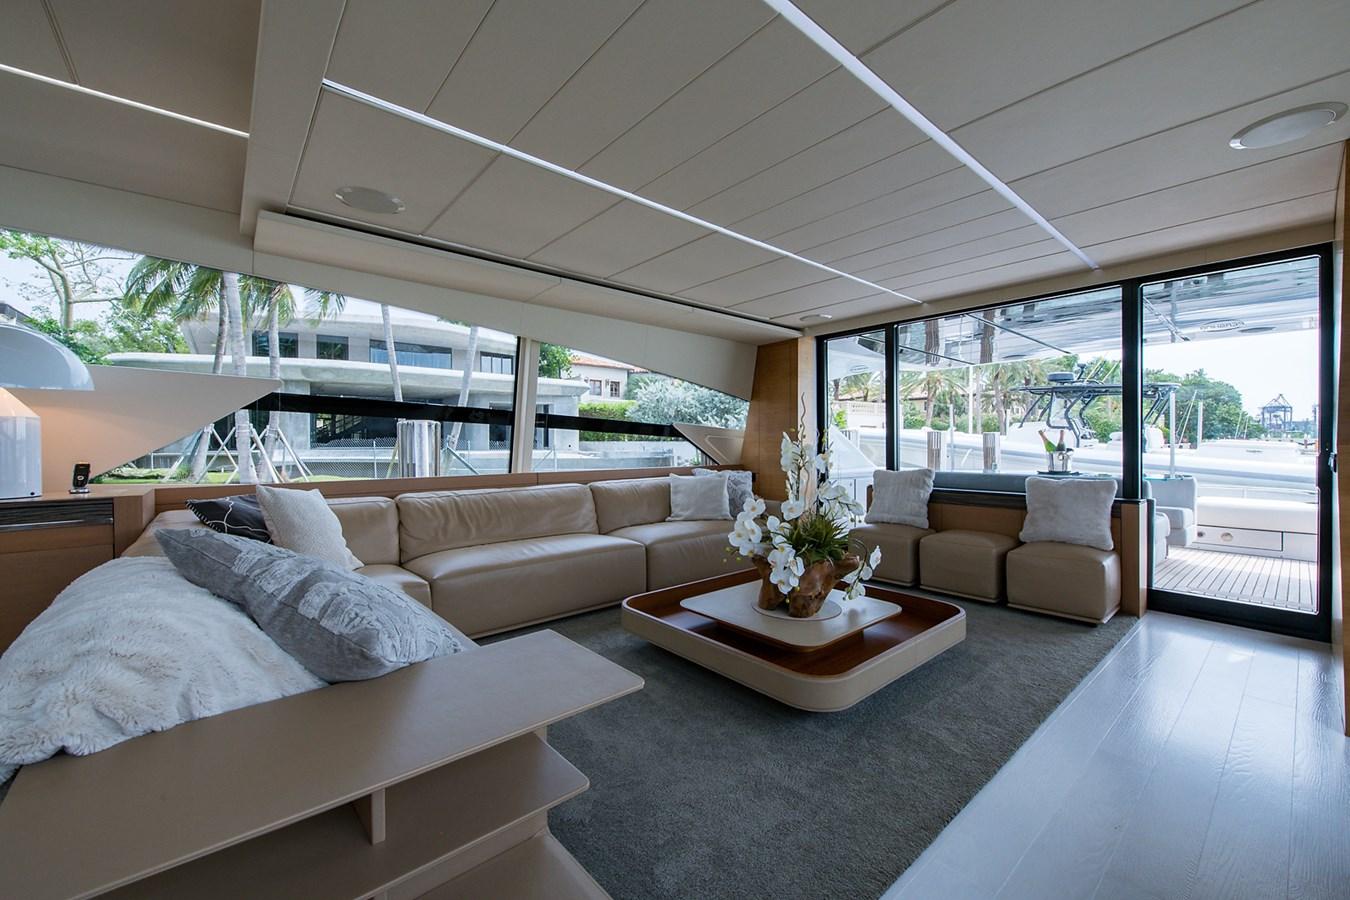 Incognito_Salon2 2012 PERSHING  Motor Yacht 2810379